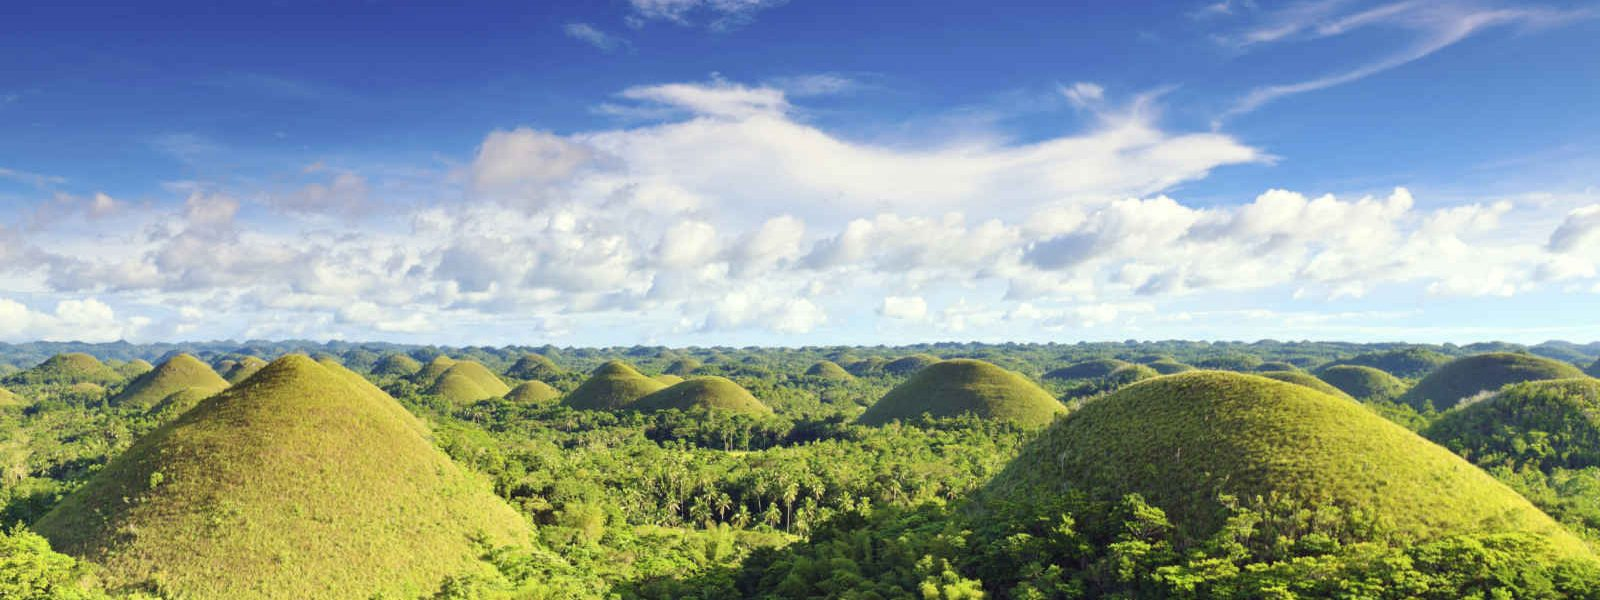 Chocolate Hills, Visayas, Philippines